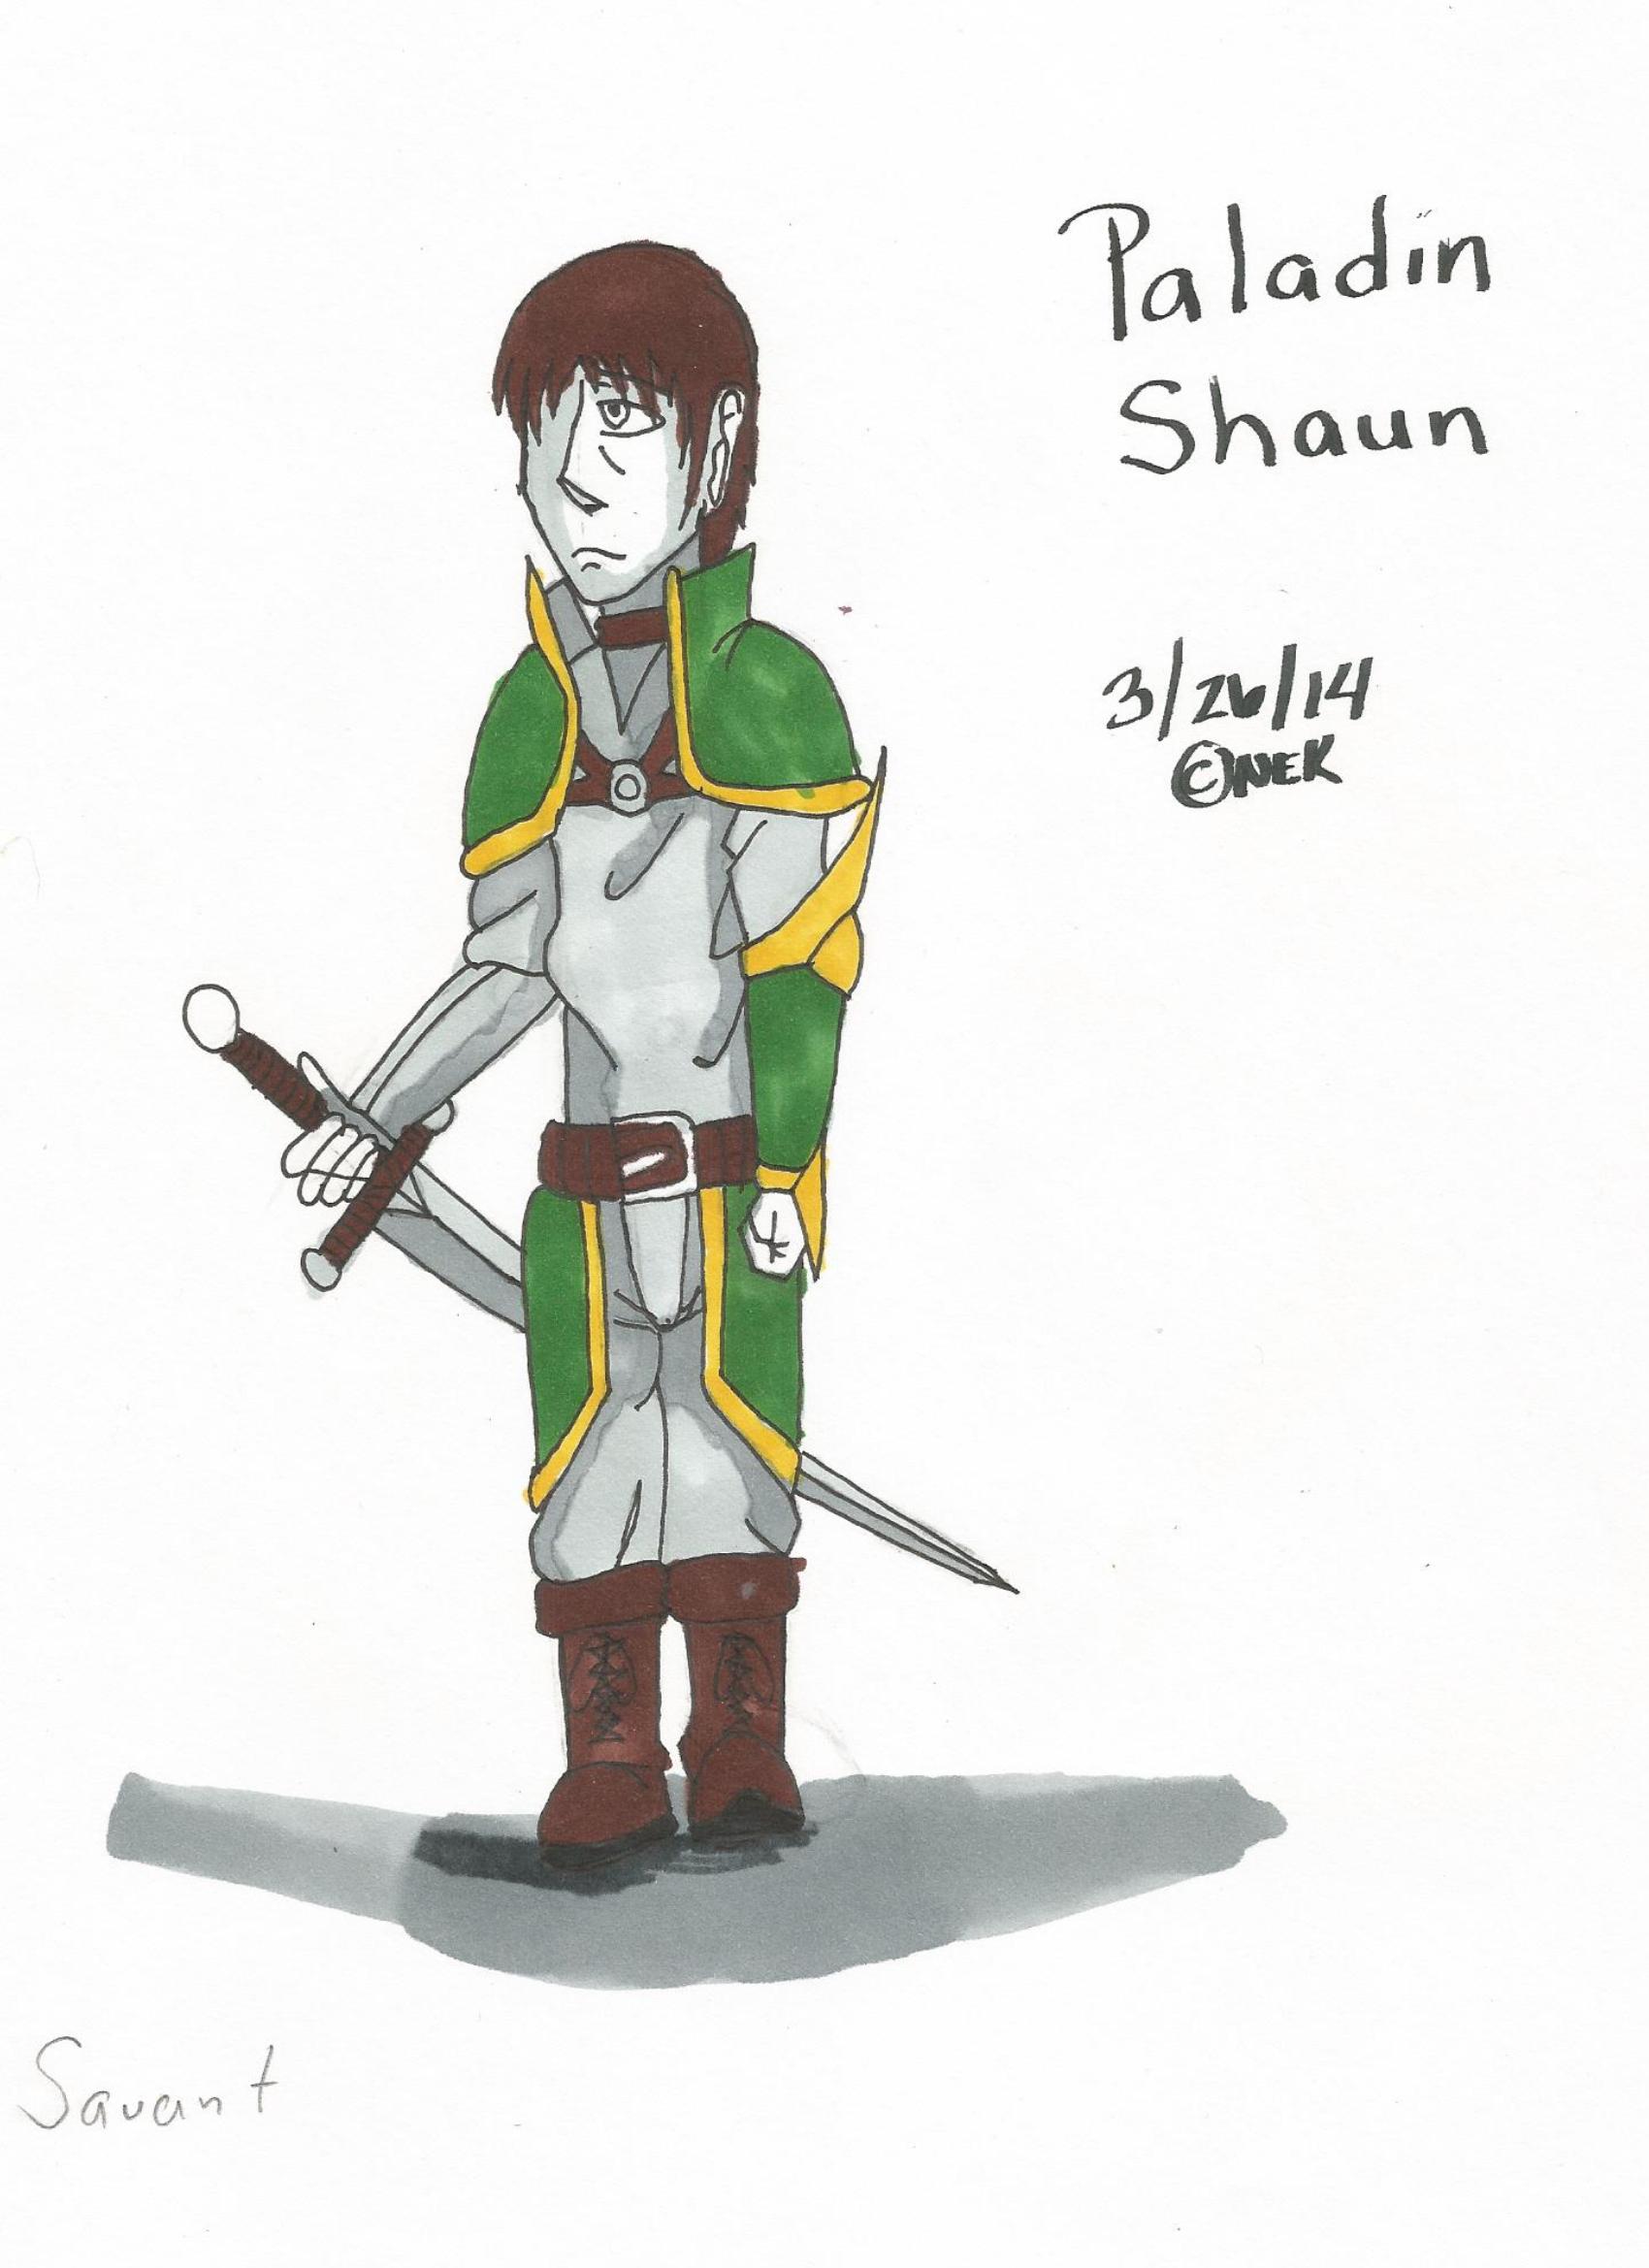 Paladin Shaun